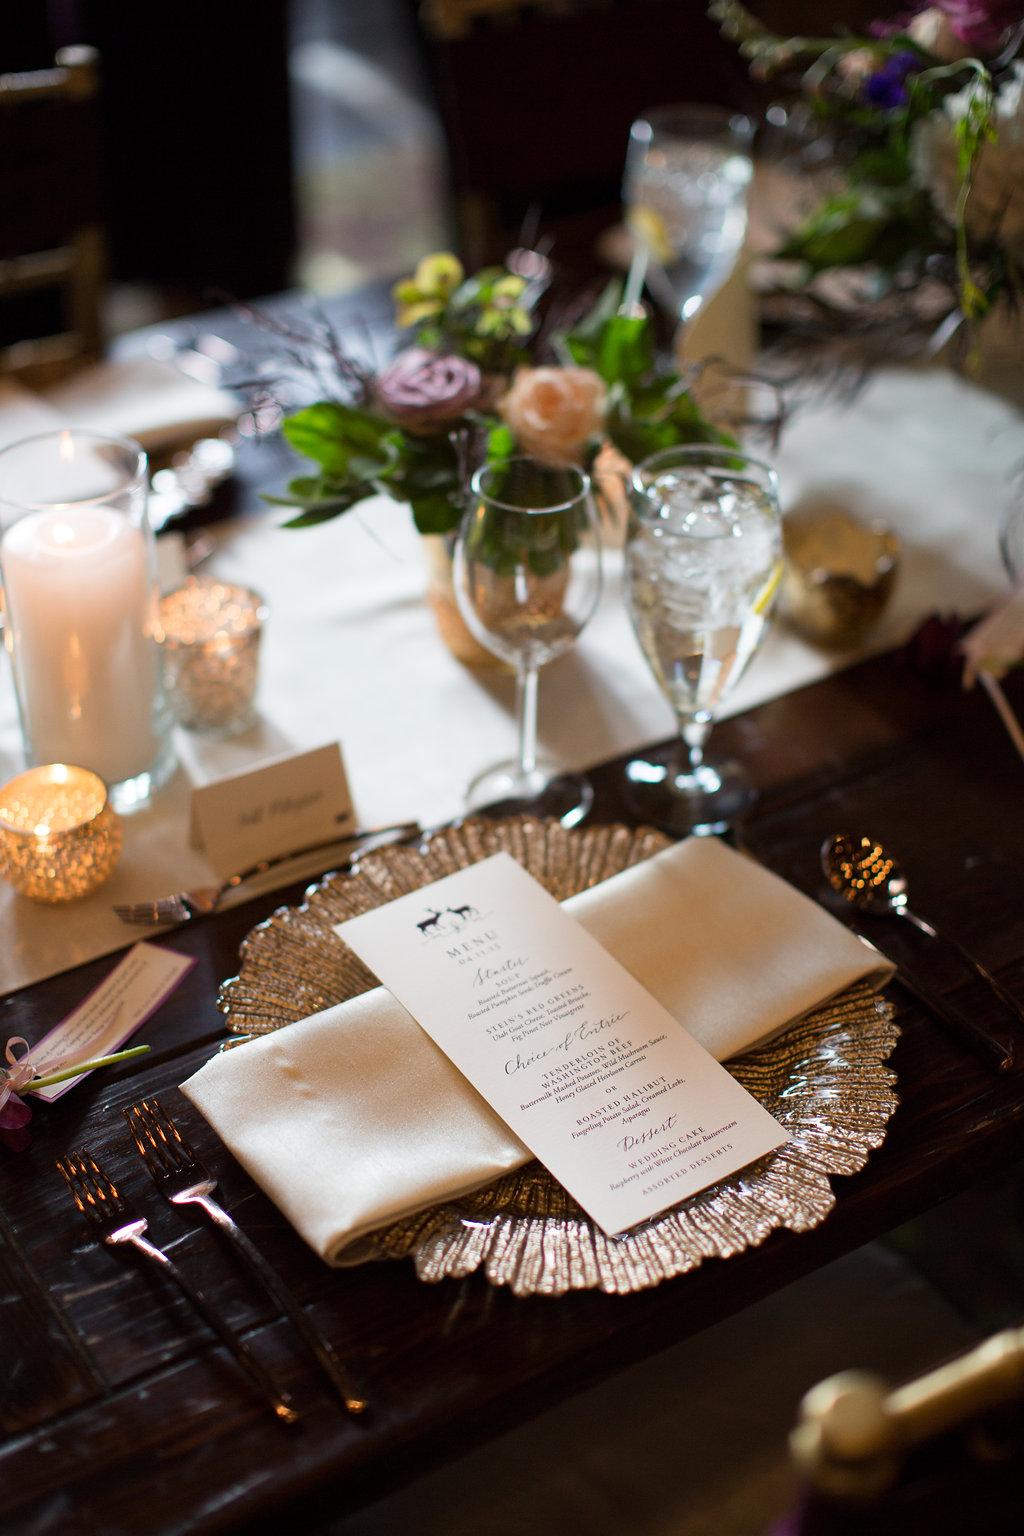 Stein Eriksen Lodge Wedding | Winter Wedding | Plum and Blush | Michelle Leo Events | Utah Wedding Design and Planning | Patricia Lyons Photography